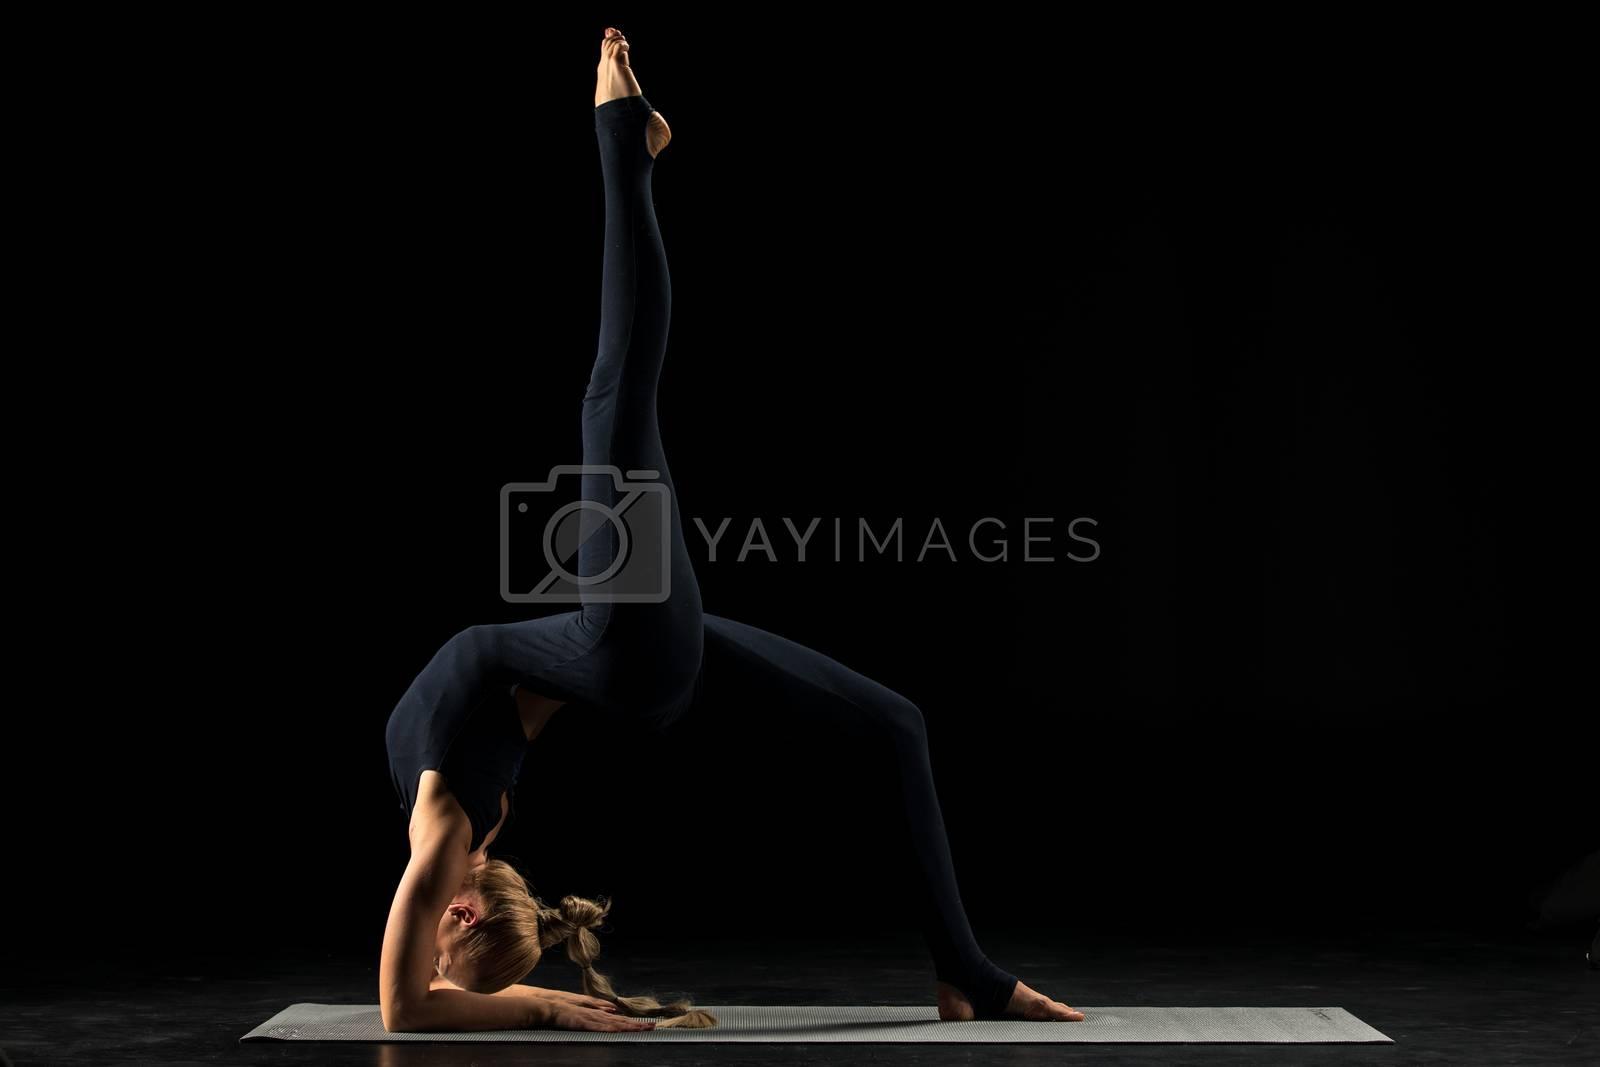 Woman practicing yoga performing Bridge pose (Ekopada Dhanurasana) on yoga mat